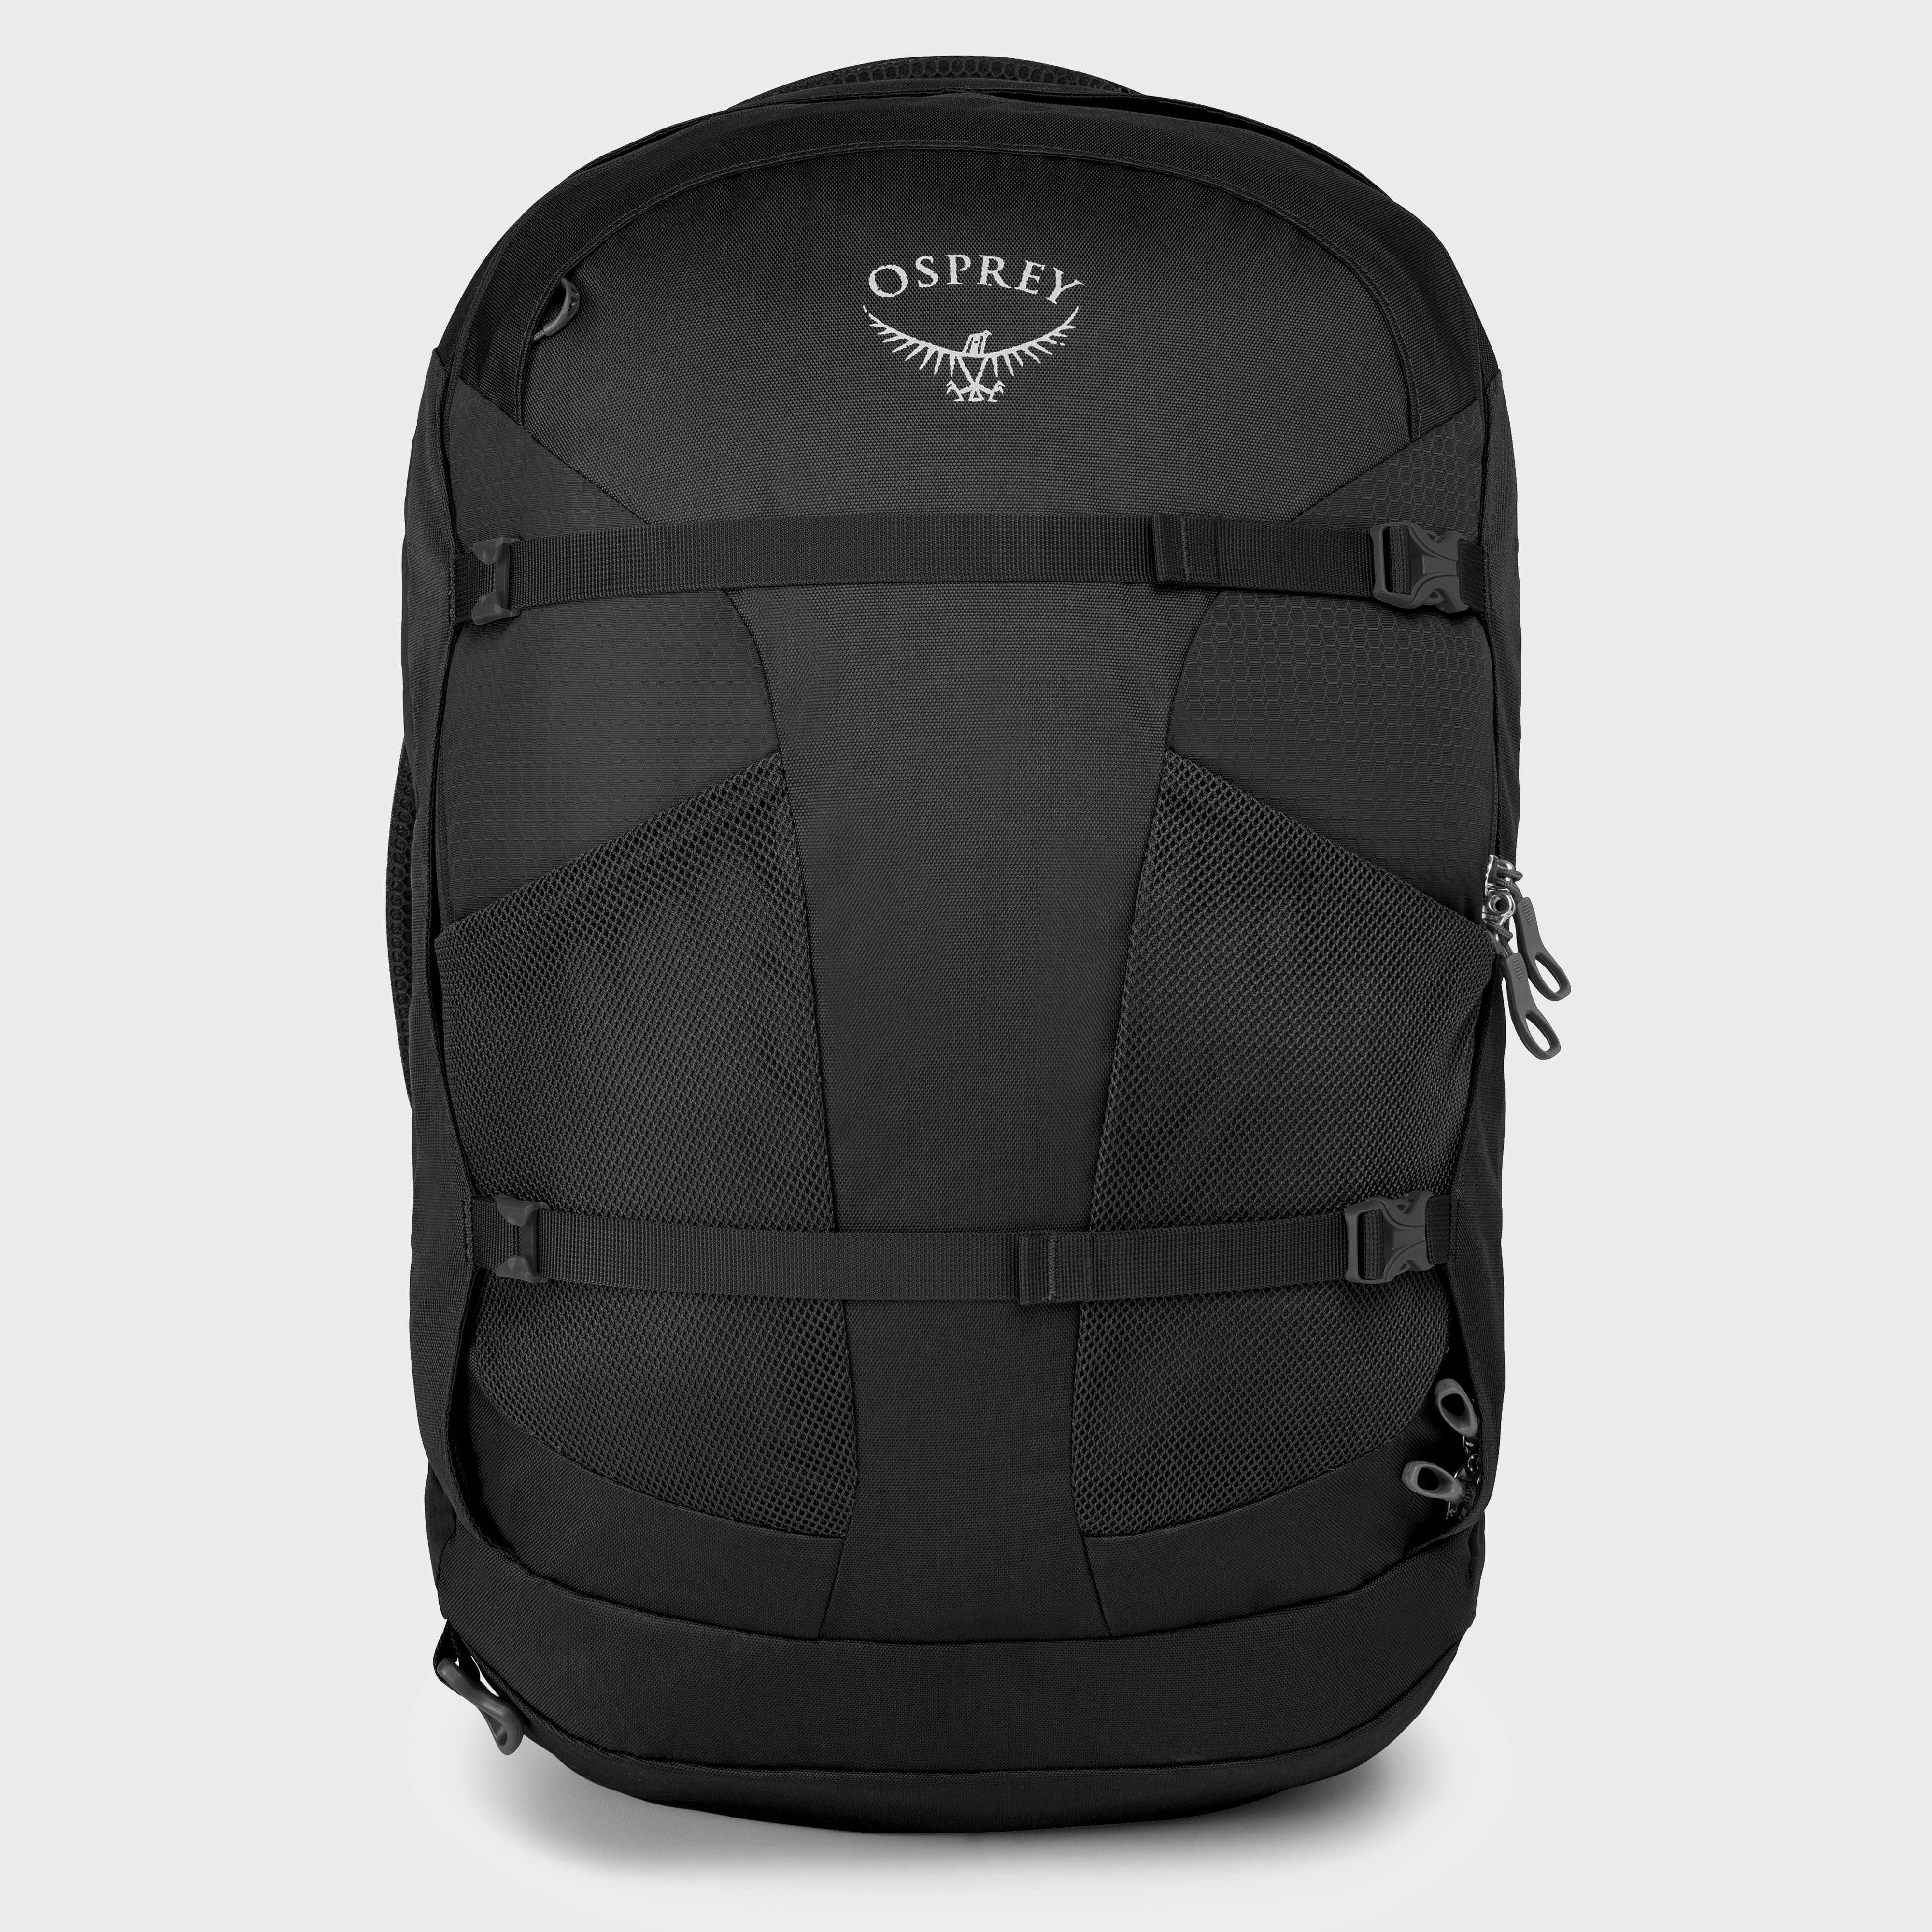 OSPREY Farpoint 40 Litre Travel Backpack (M/L)